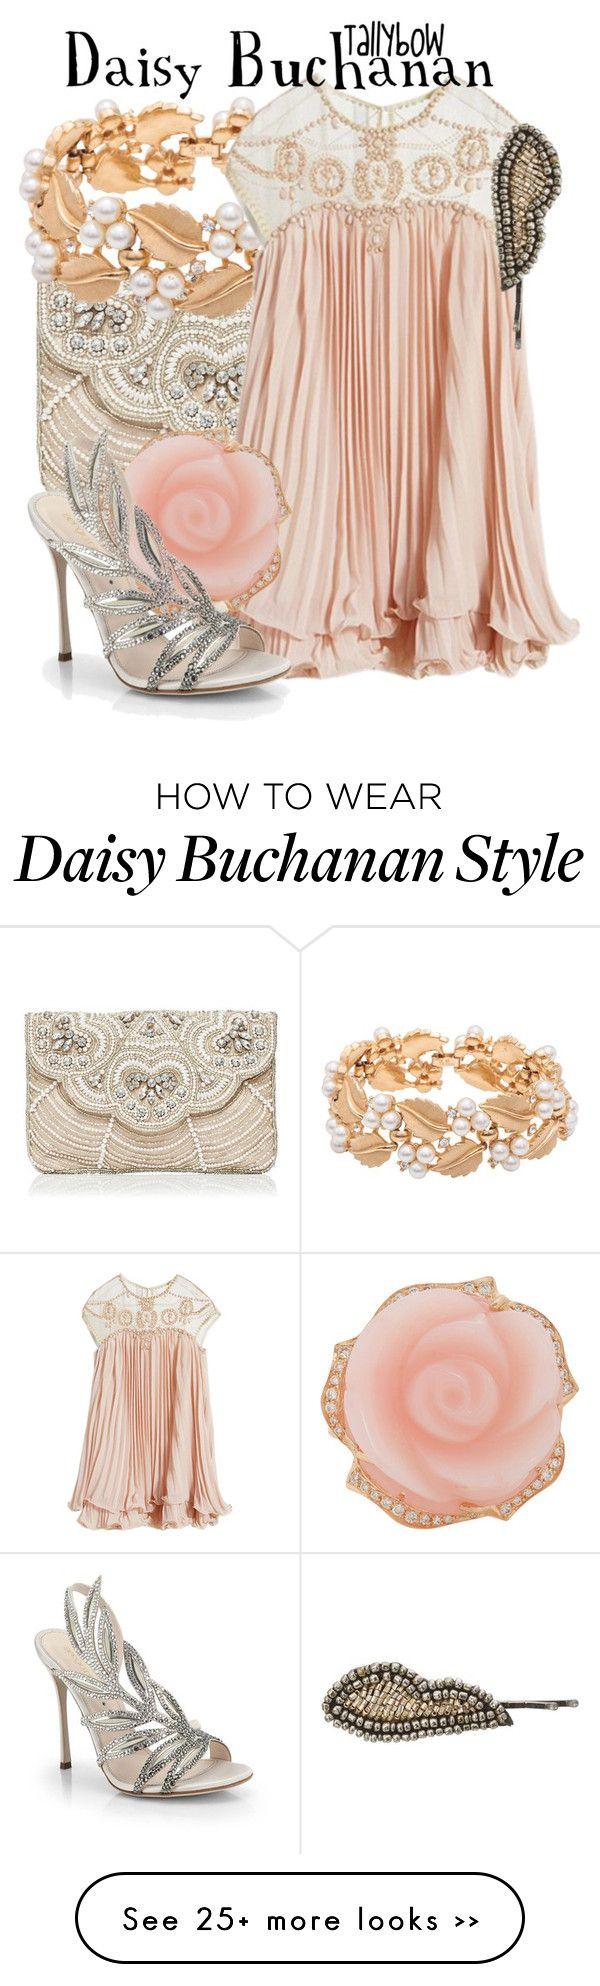 """Daisy Buchanan"" by tallybow on Polyvore"